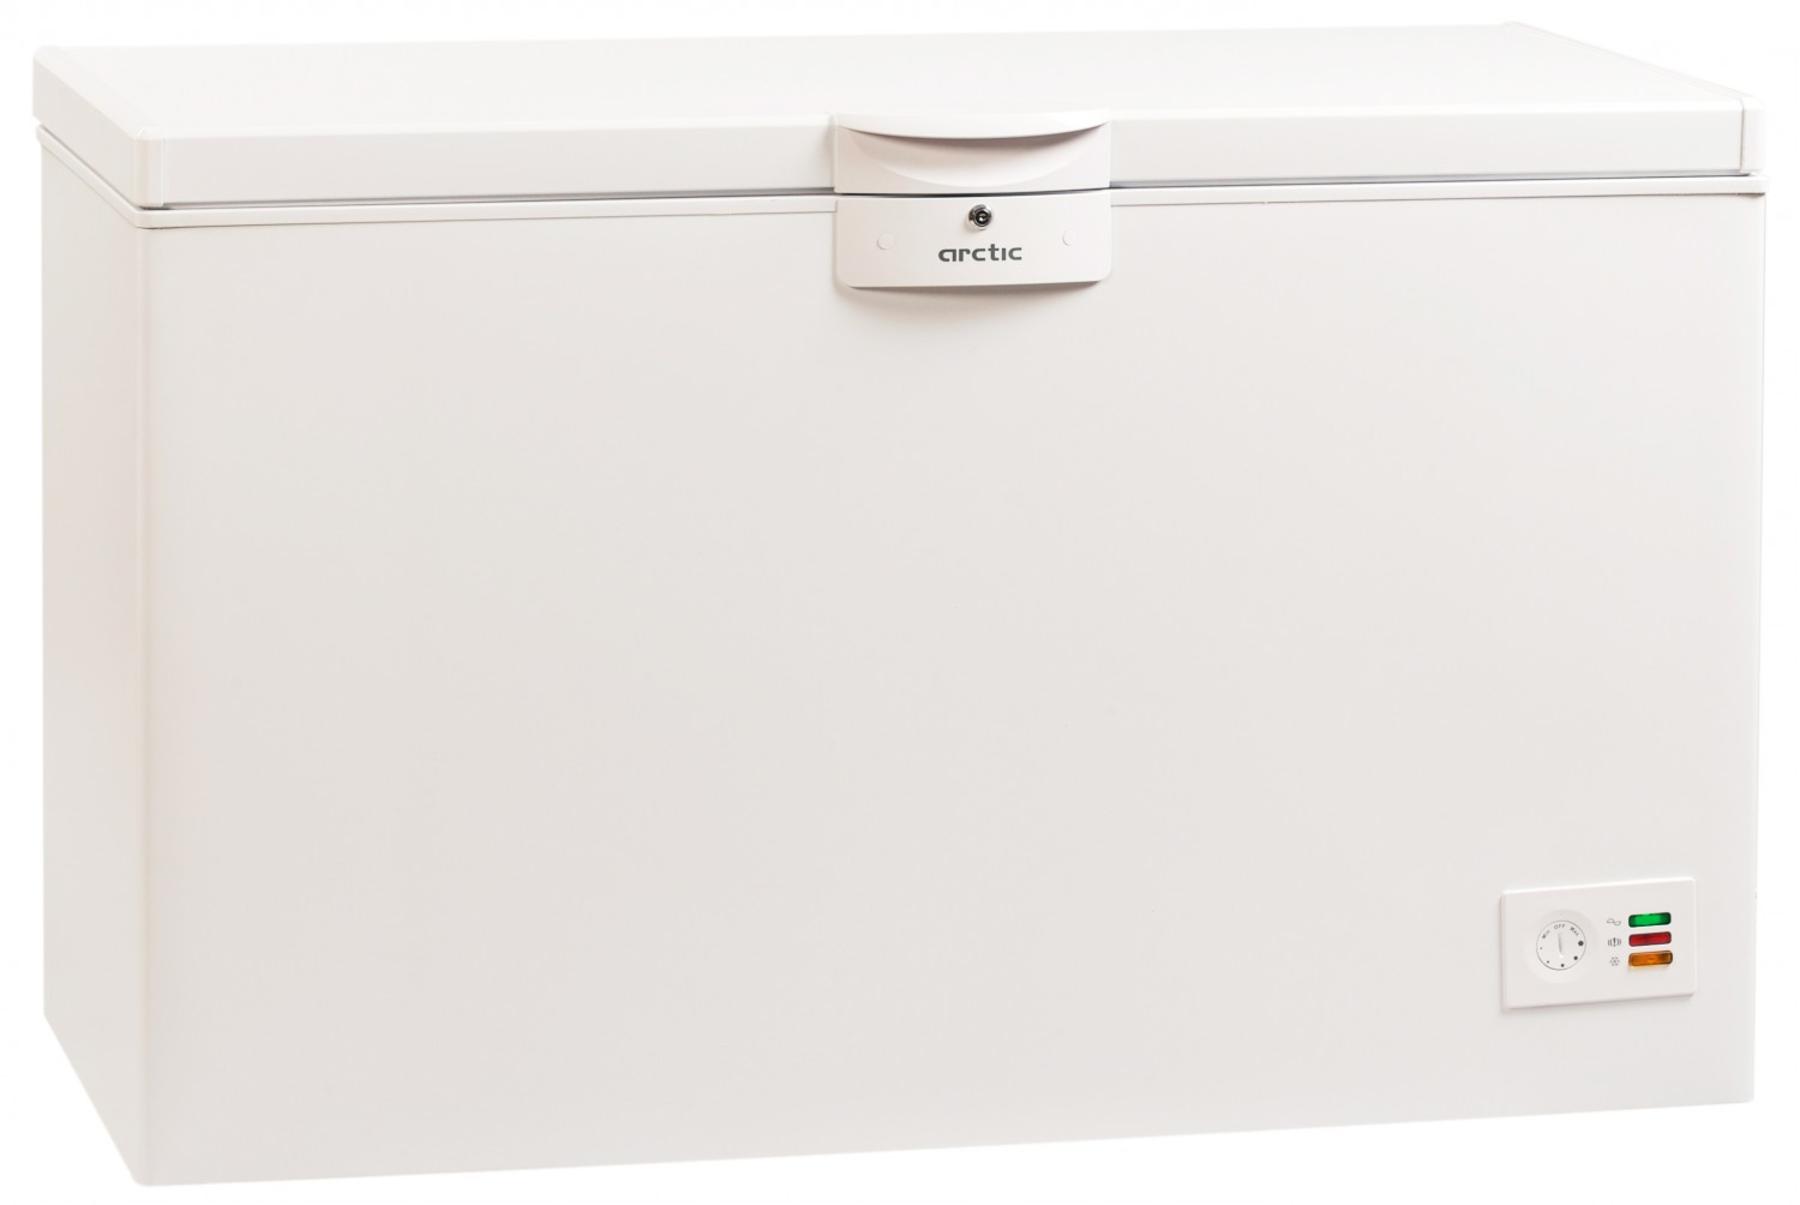 Lada frigorifica Arctic O40+, 360 l, Clasa A+, 2 cosuri, Yala, L 128.5 cm, Alb